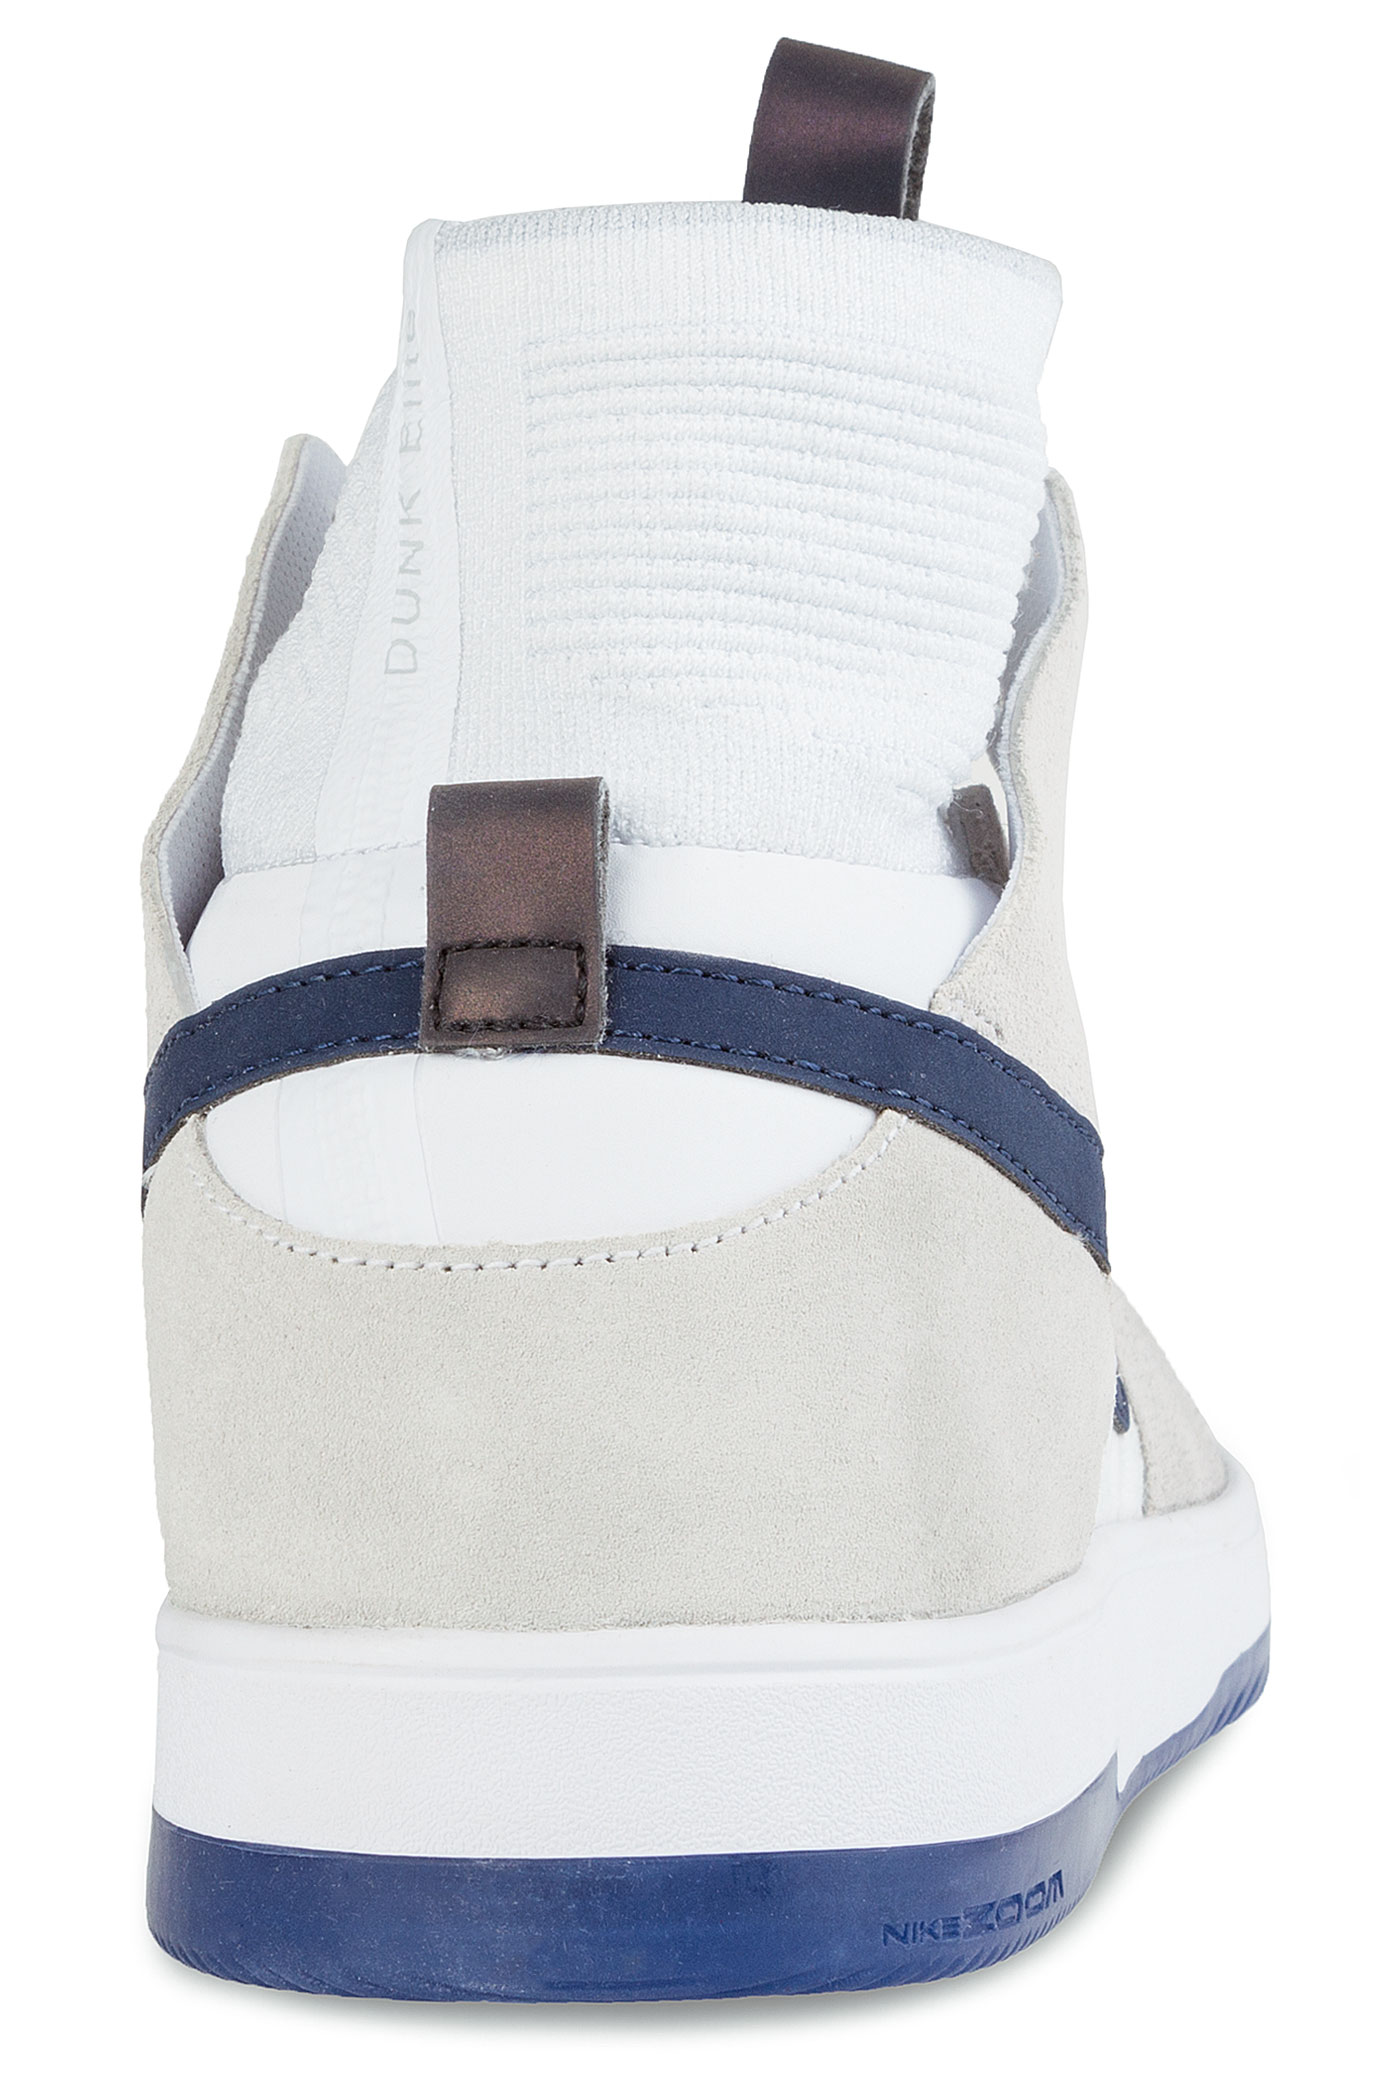 dc135f6a22a12 Nike SB Dunk High Elite Cyrus Bennett QS Shoes (white midnight navy ...